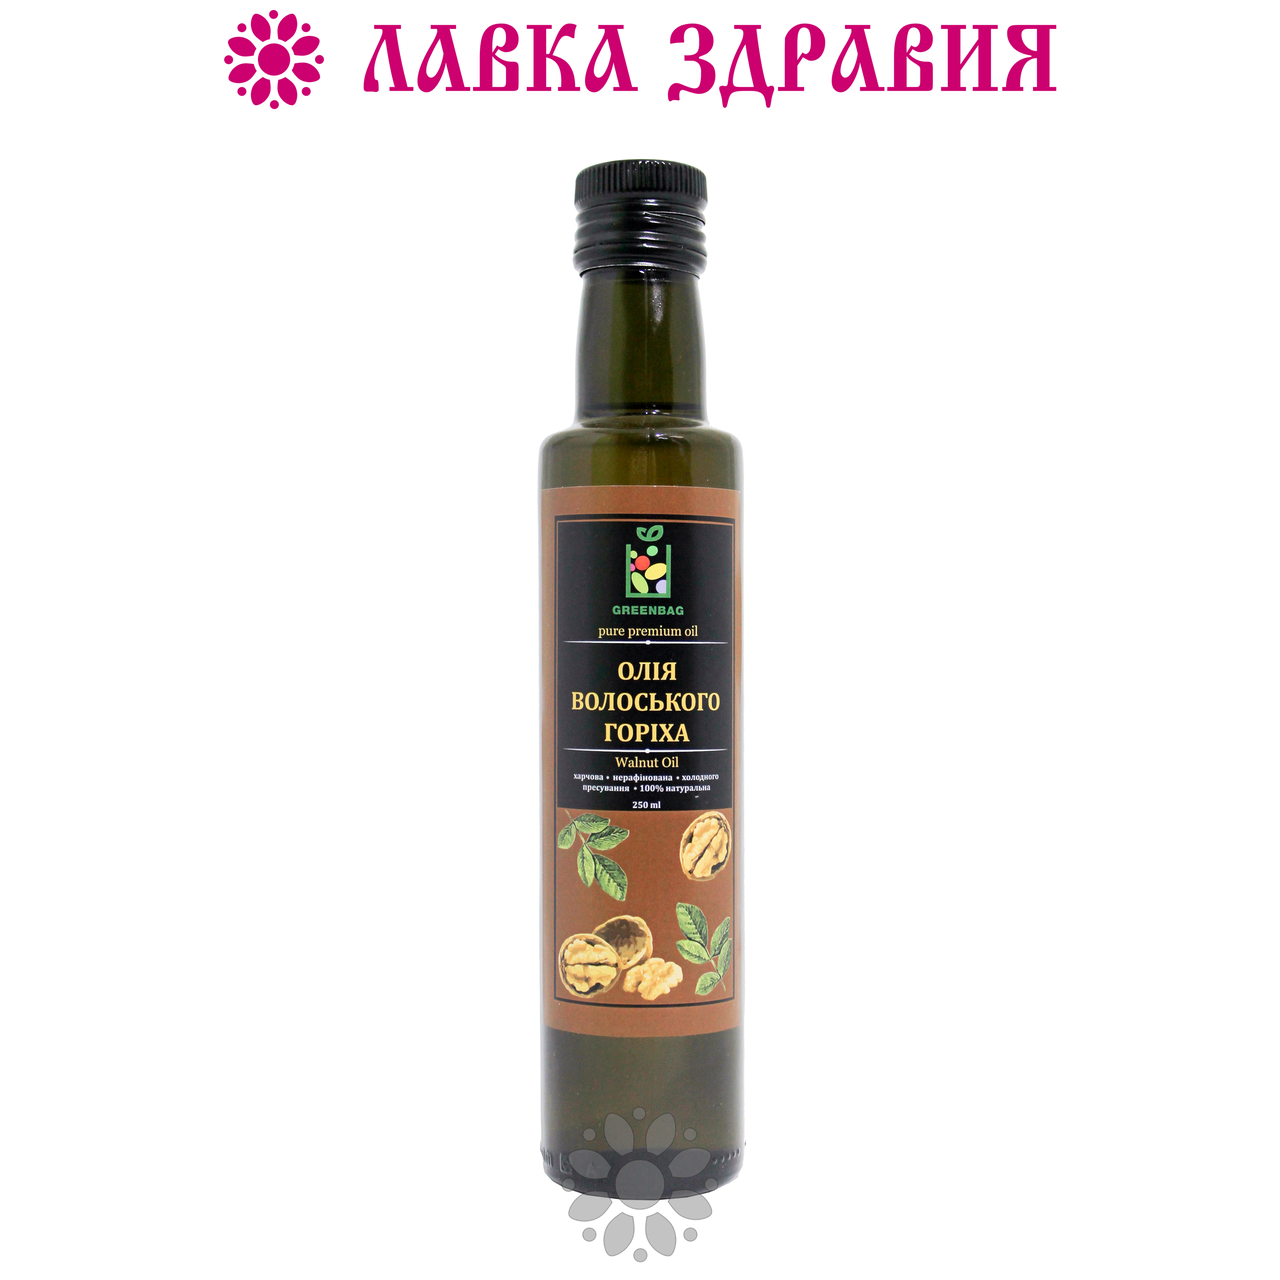 Масло грецкого ореха, 250 мл, Гринбэг